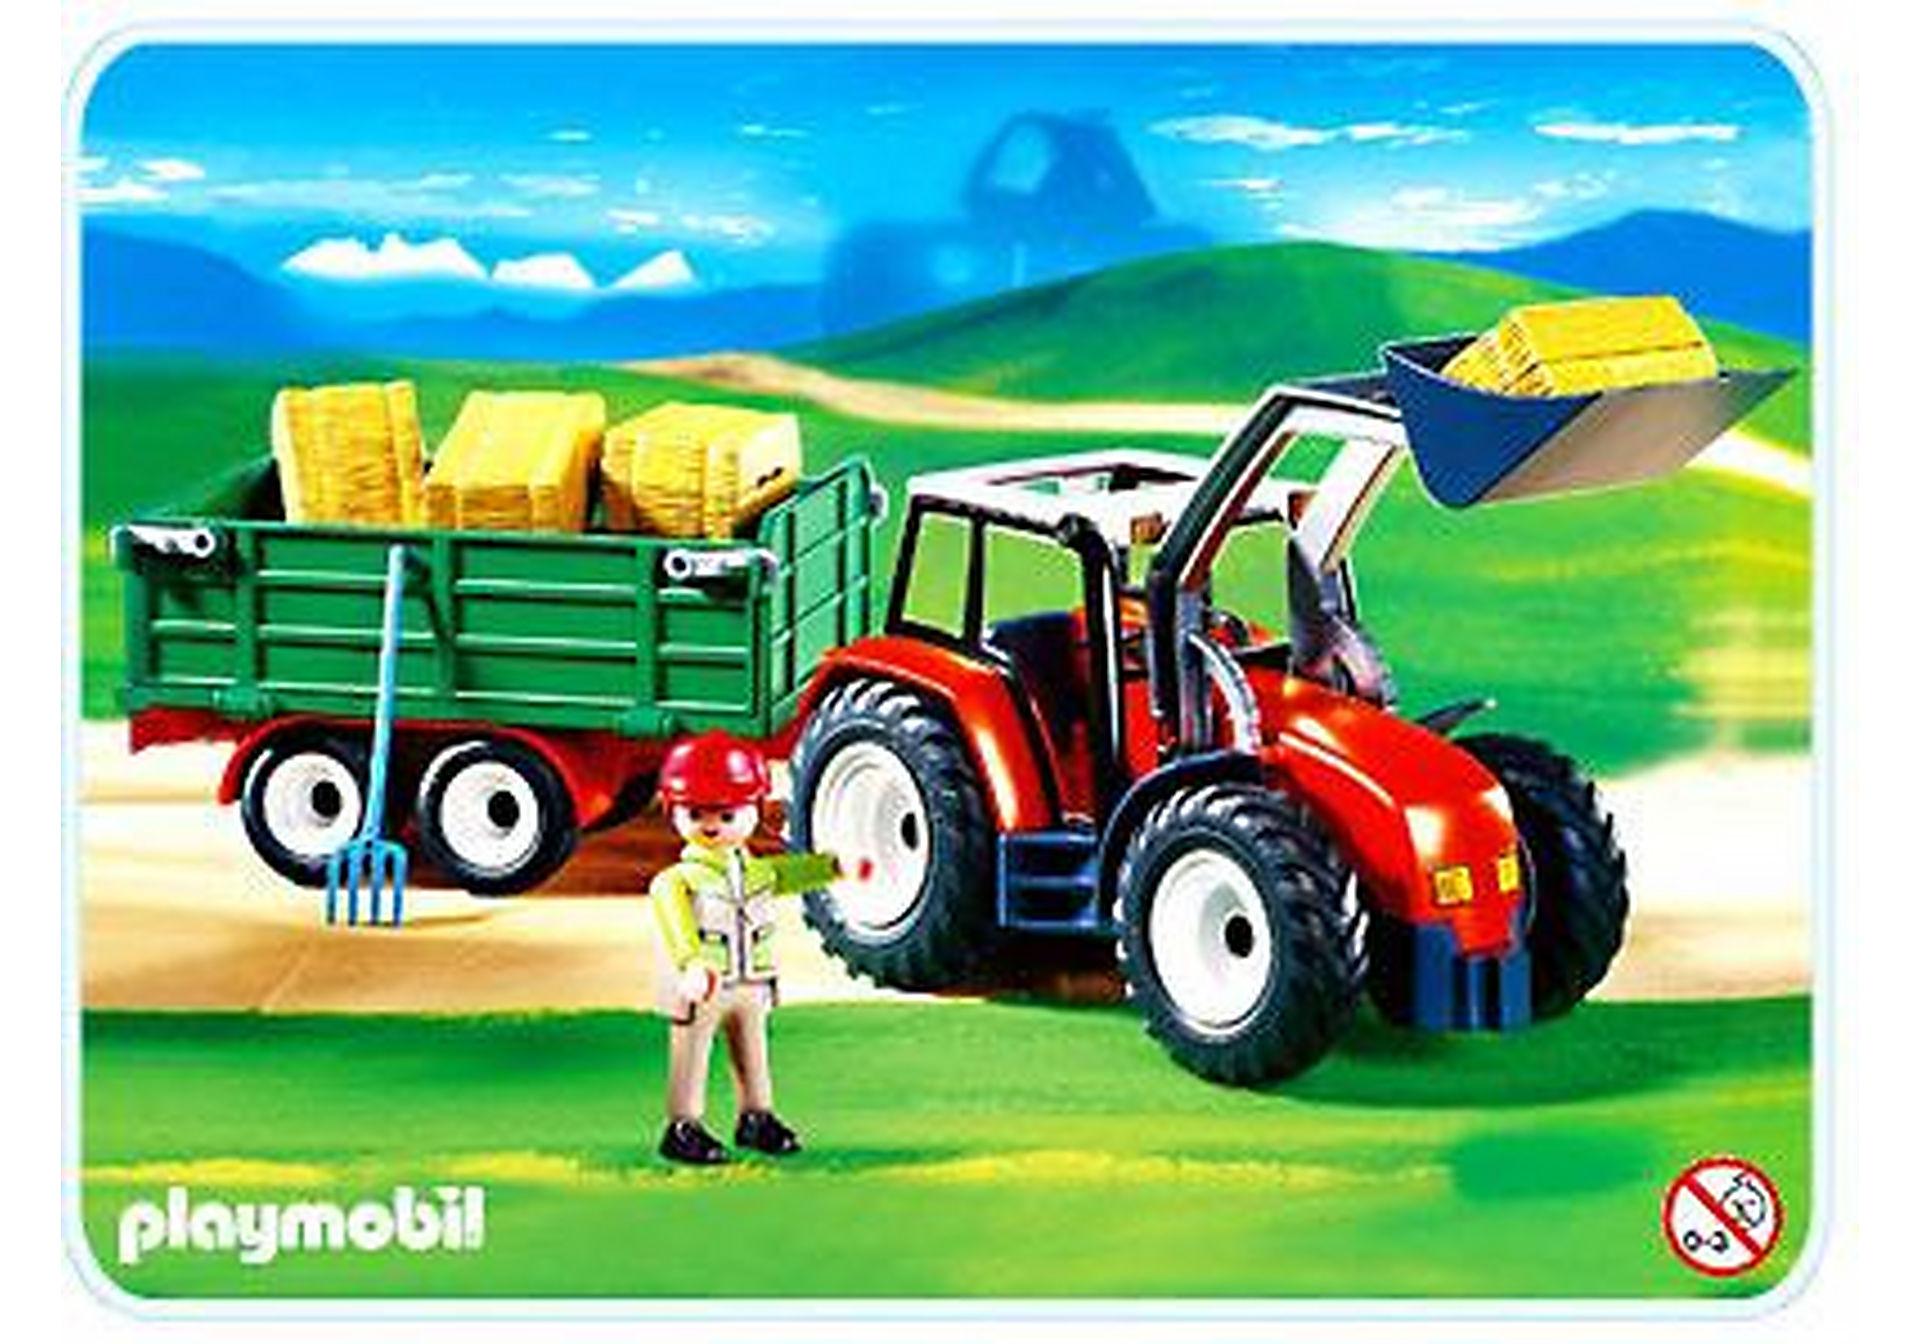 4496-A Großer Traktor mit Anhänger zoom image1